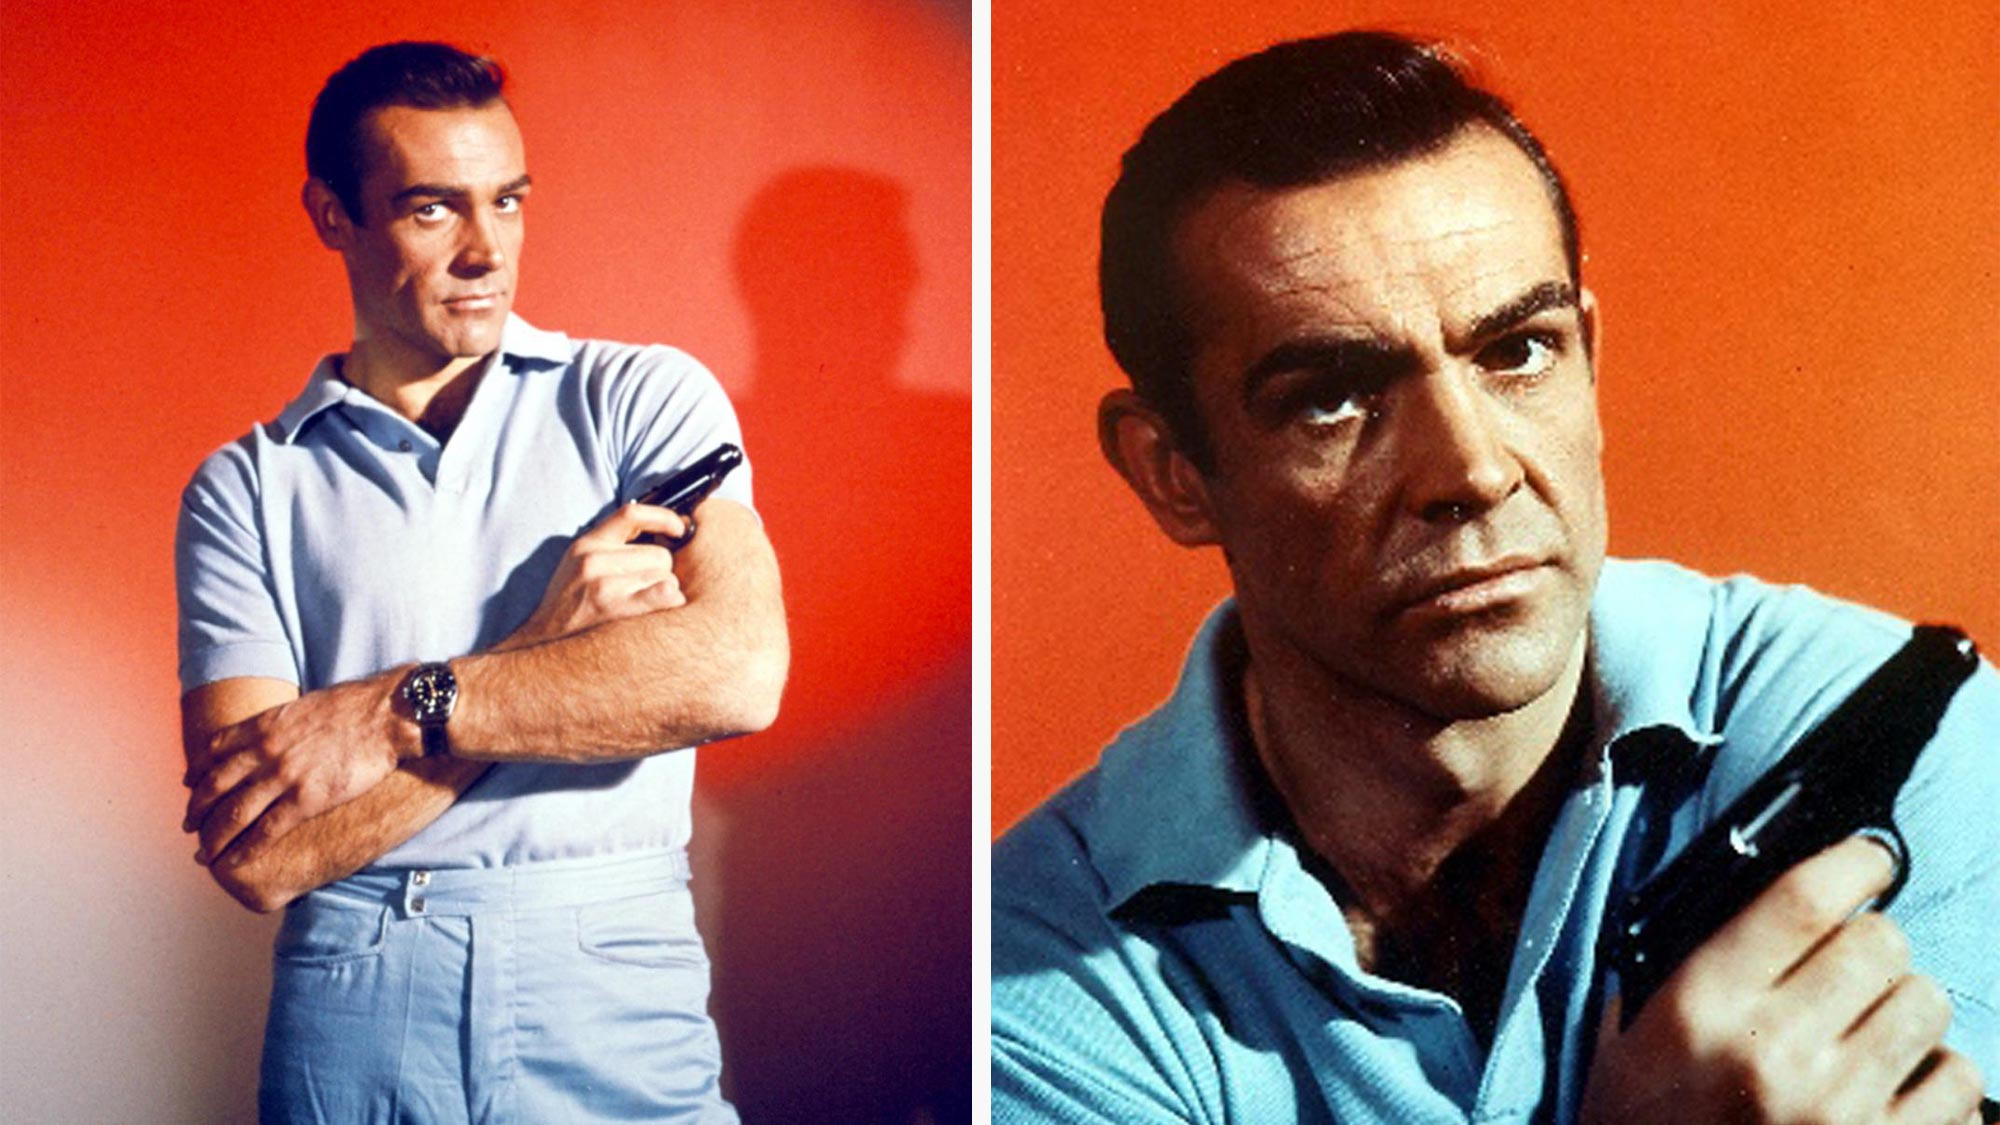 Sean Connery James Bond Walther PPK Pistol Auction